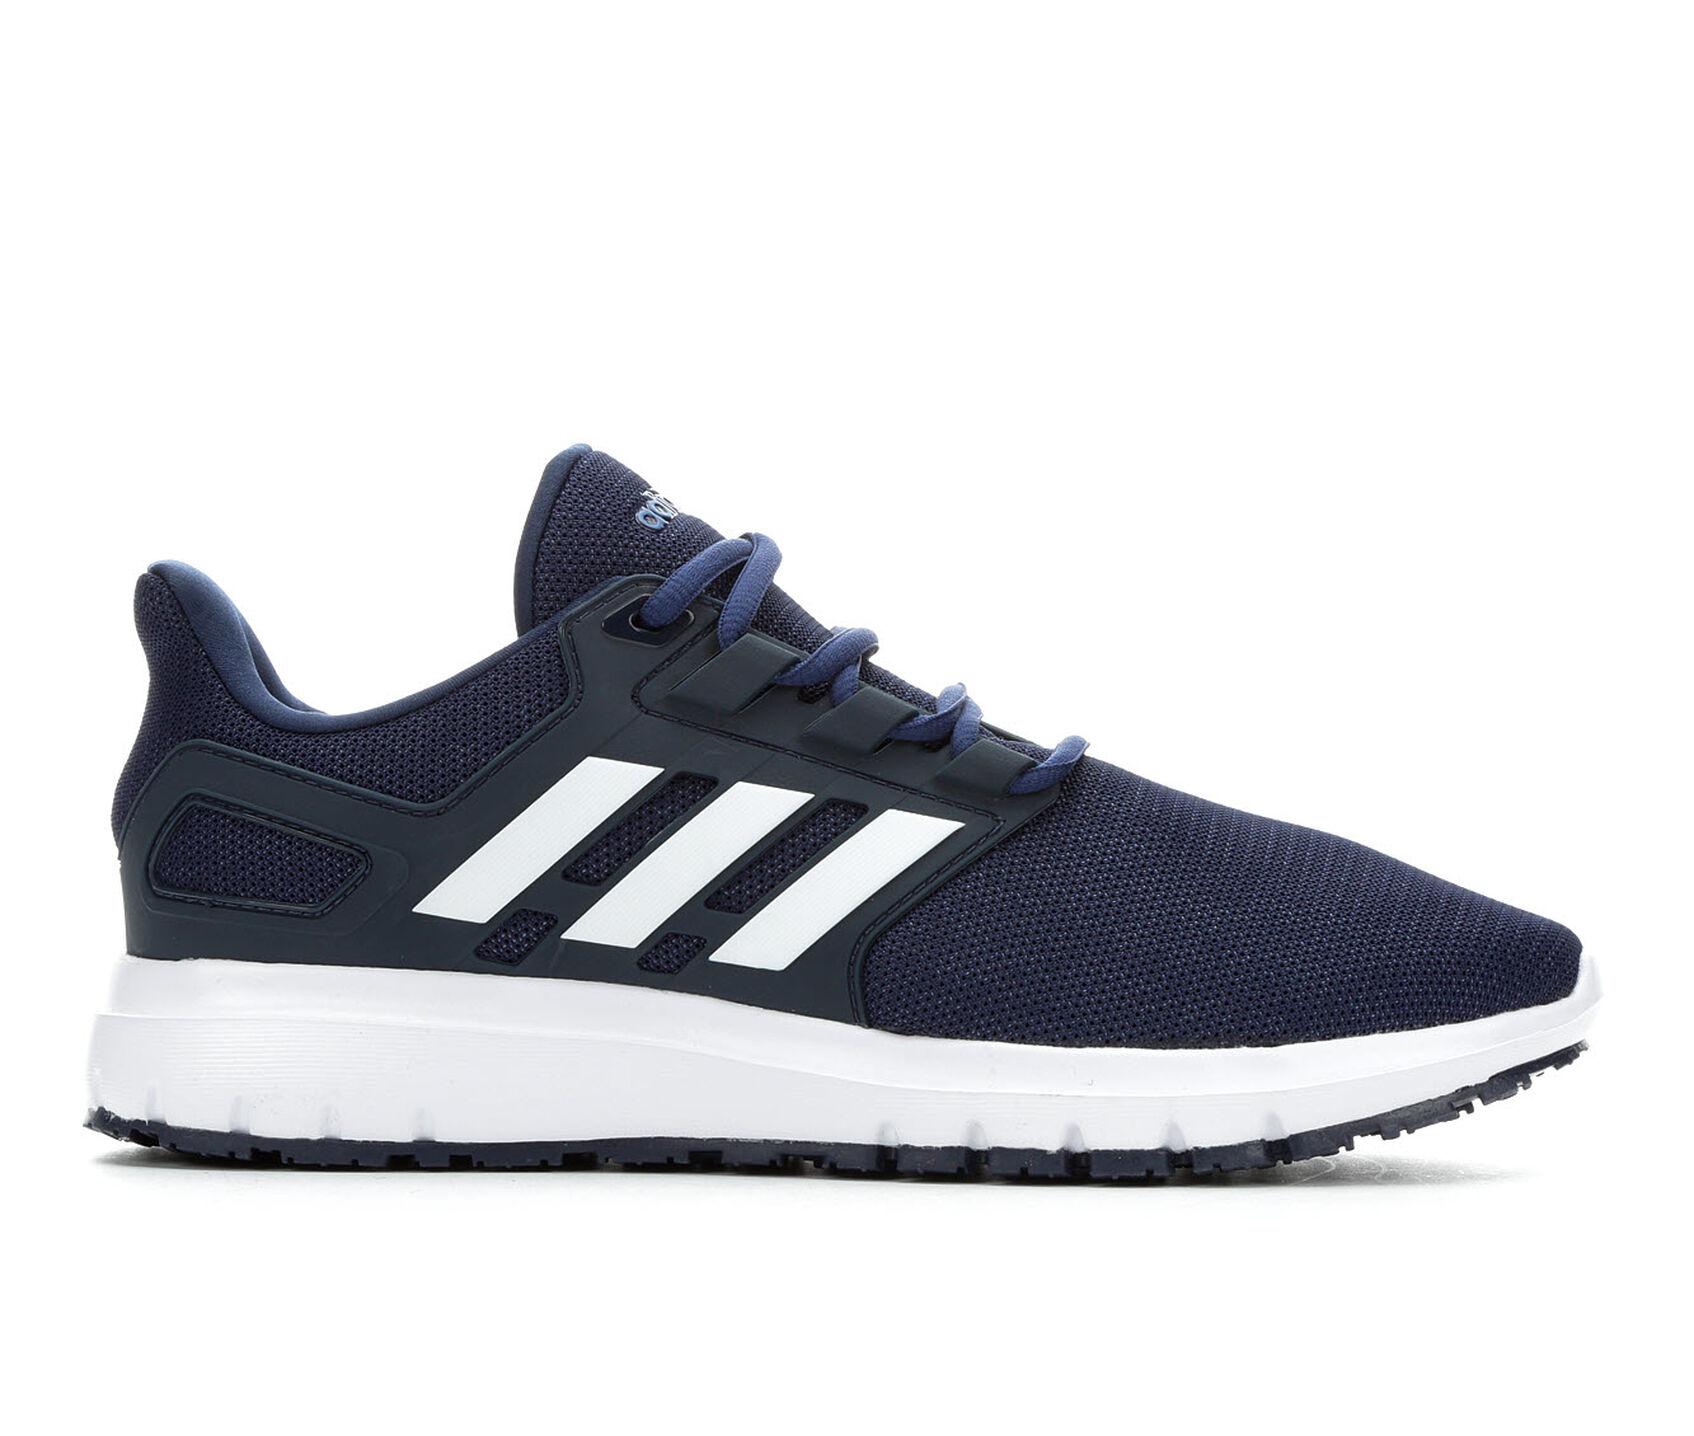 7f35de780 Men's Adidas Energy Cloud Running Shoes | Shoe Carnival